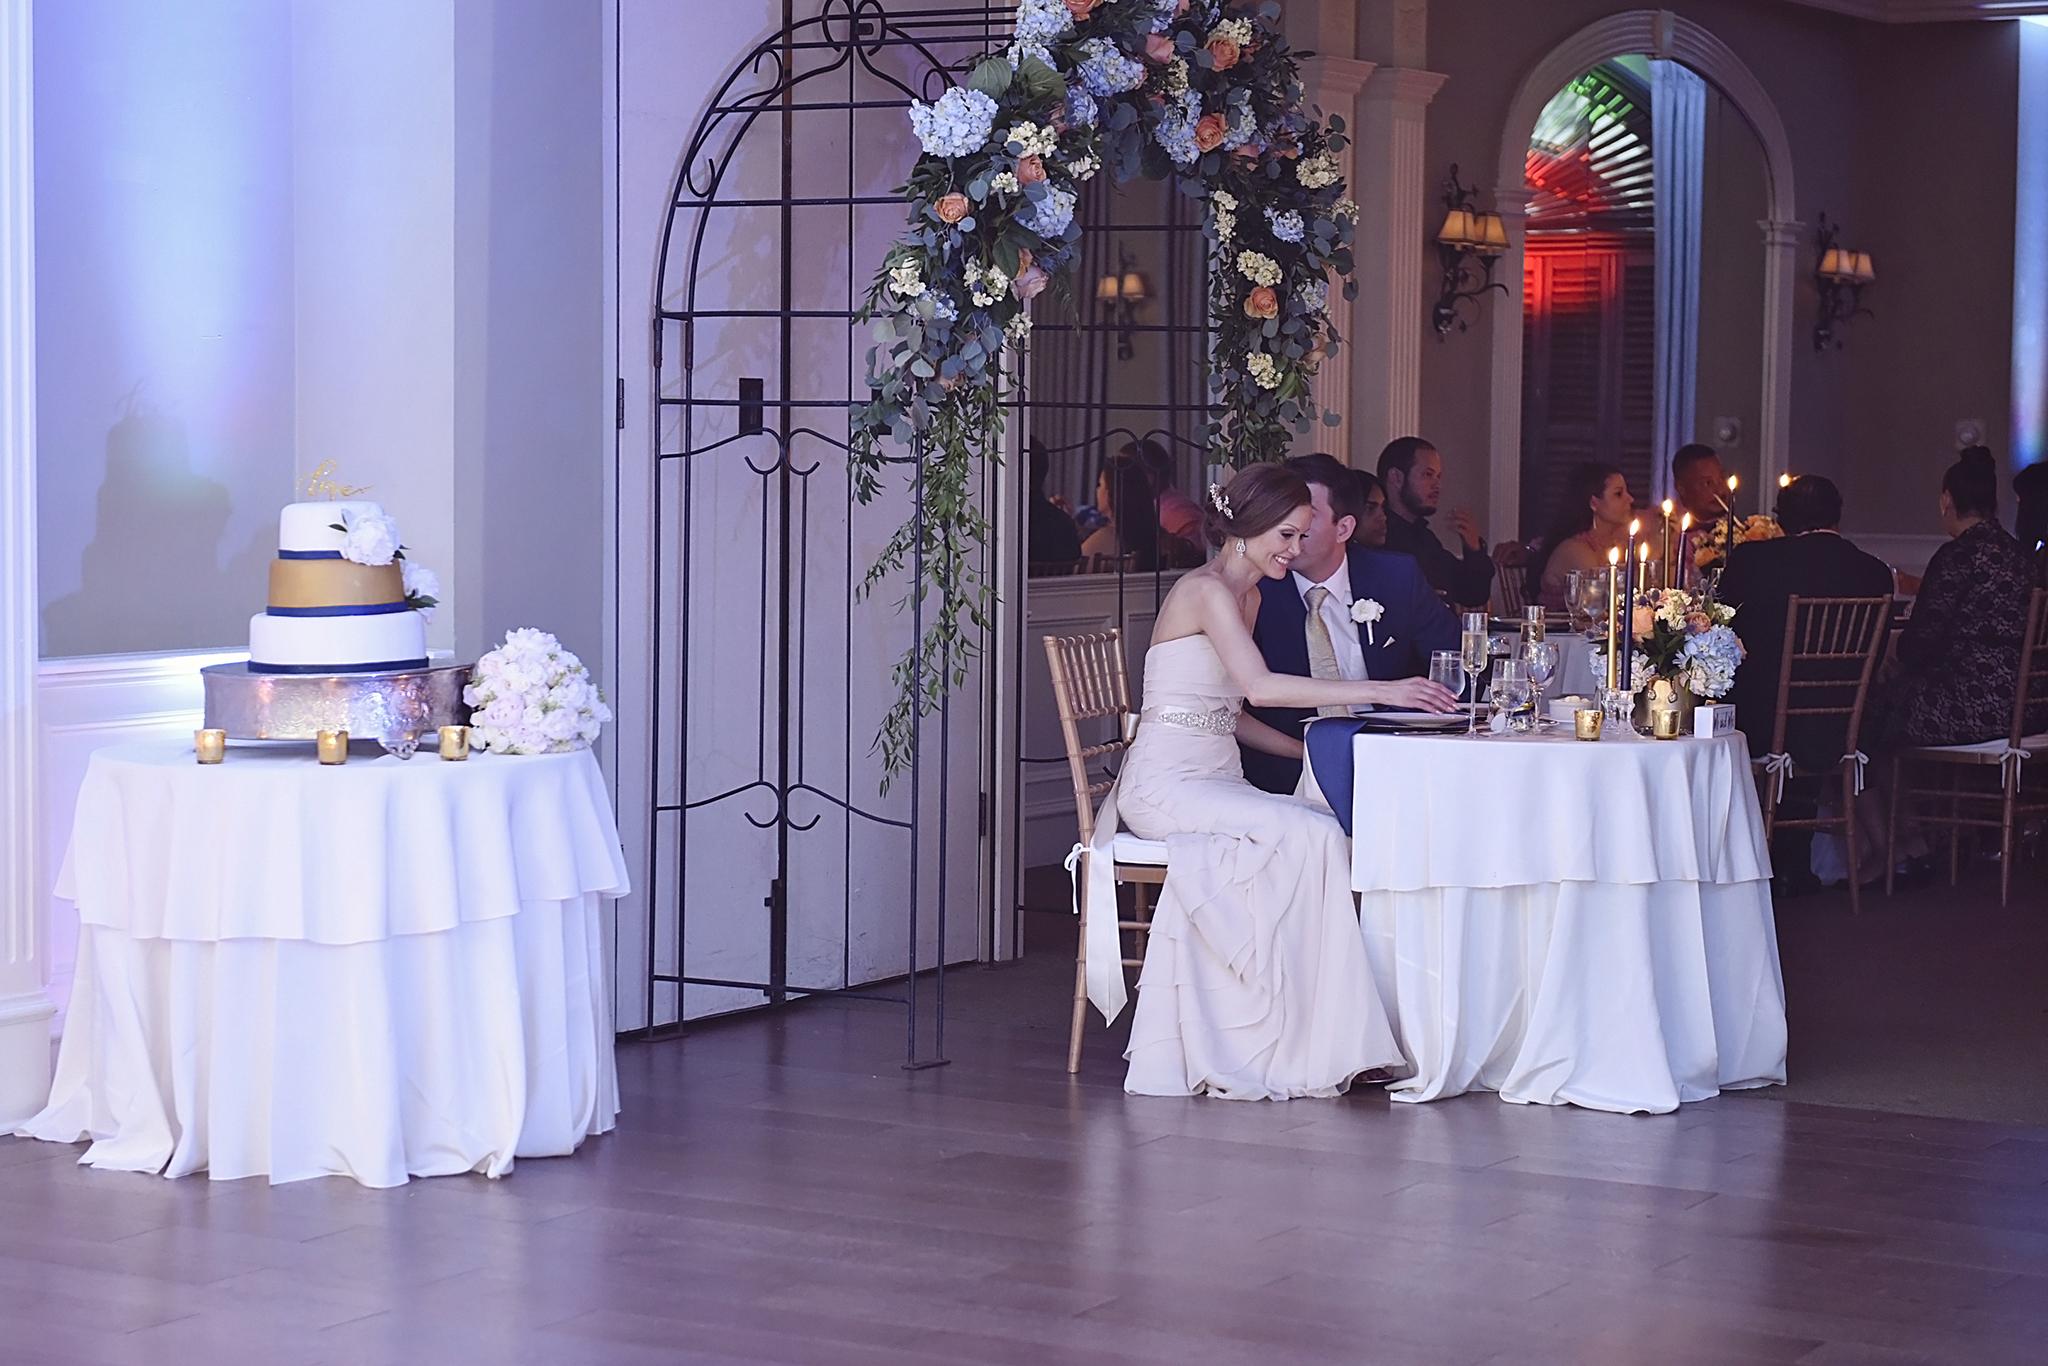 NJ-NY-wedding-photographer-141NJ-NY-wedding-photographer-141NJ-NY-WEDDING-PHOTOGRAPHER-141.JPG